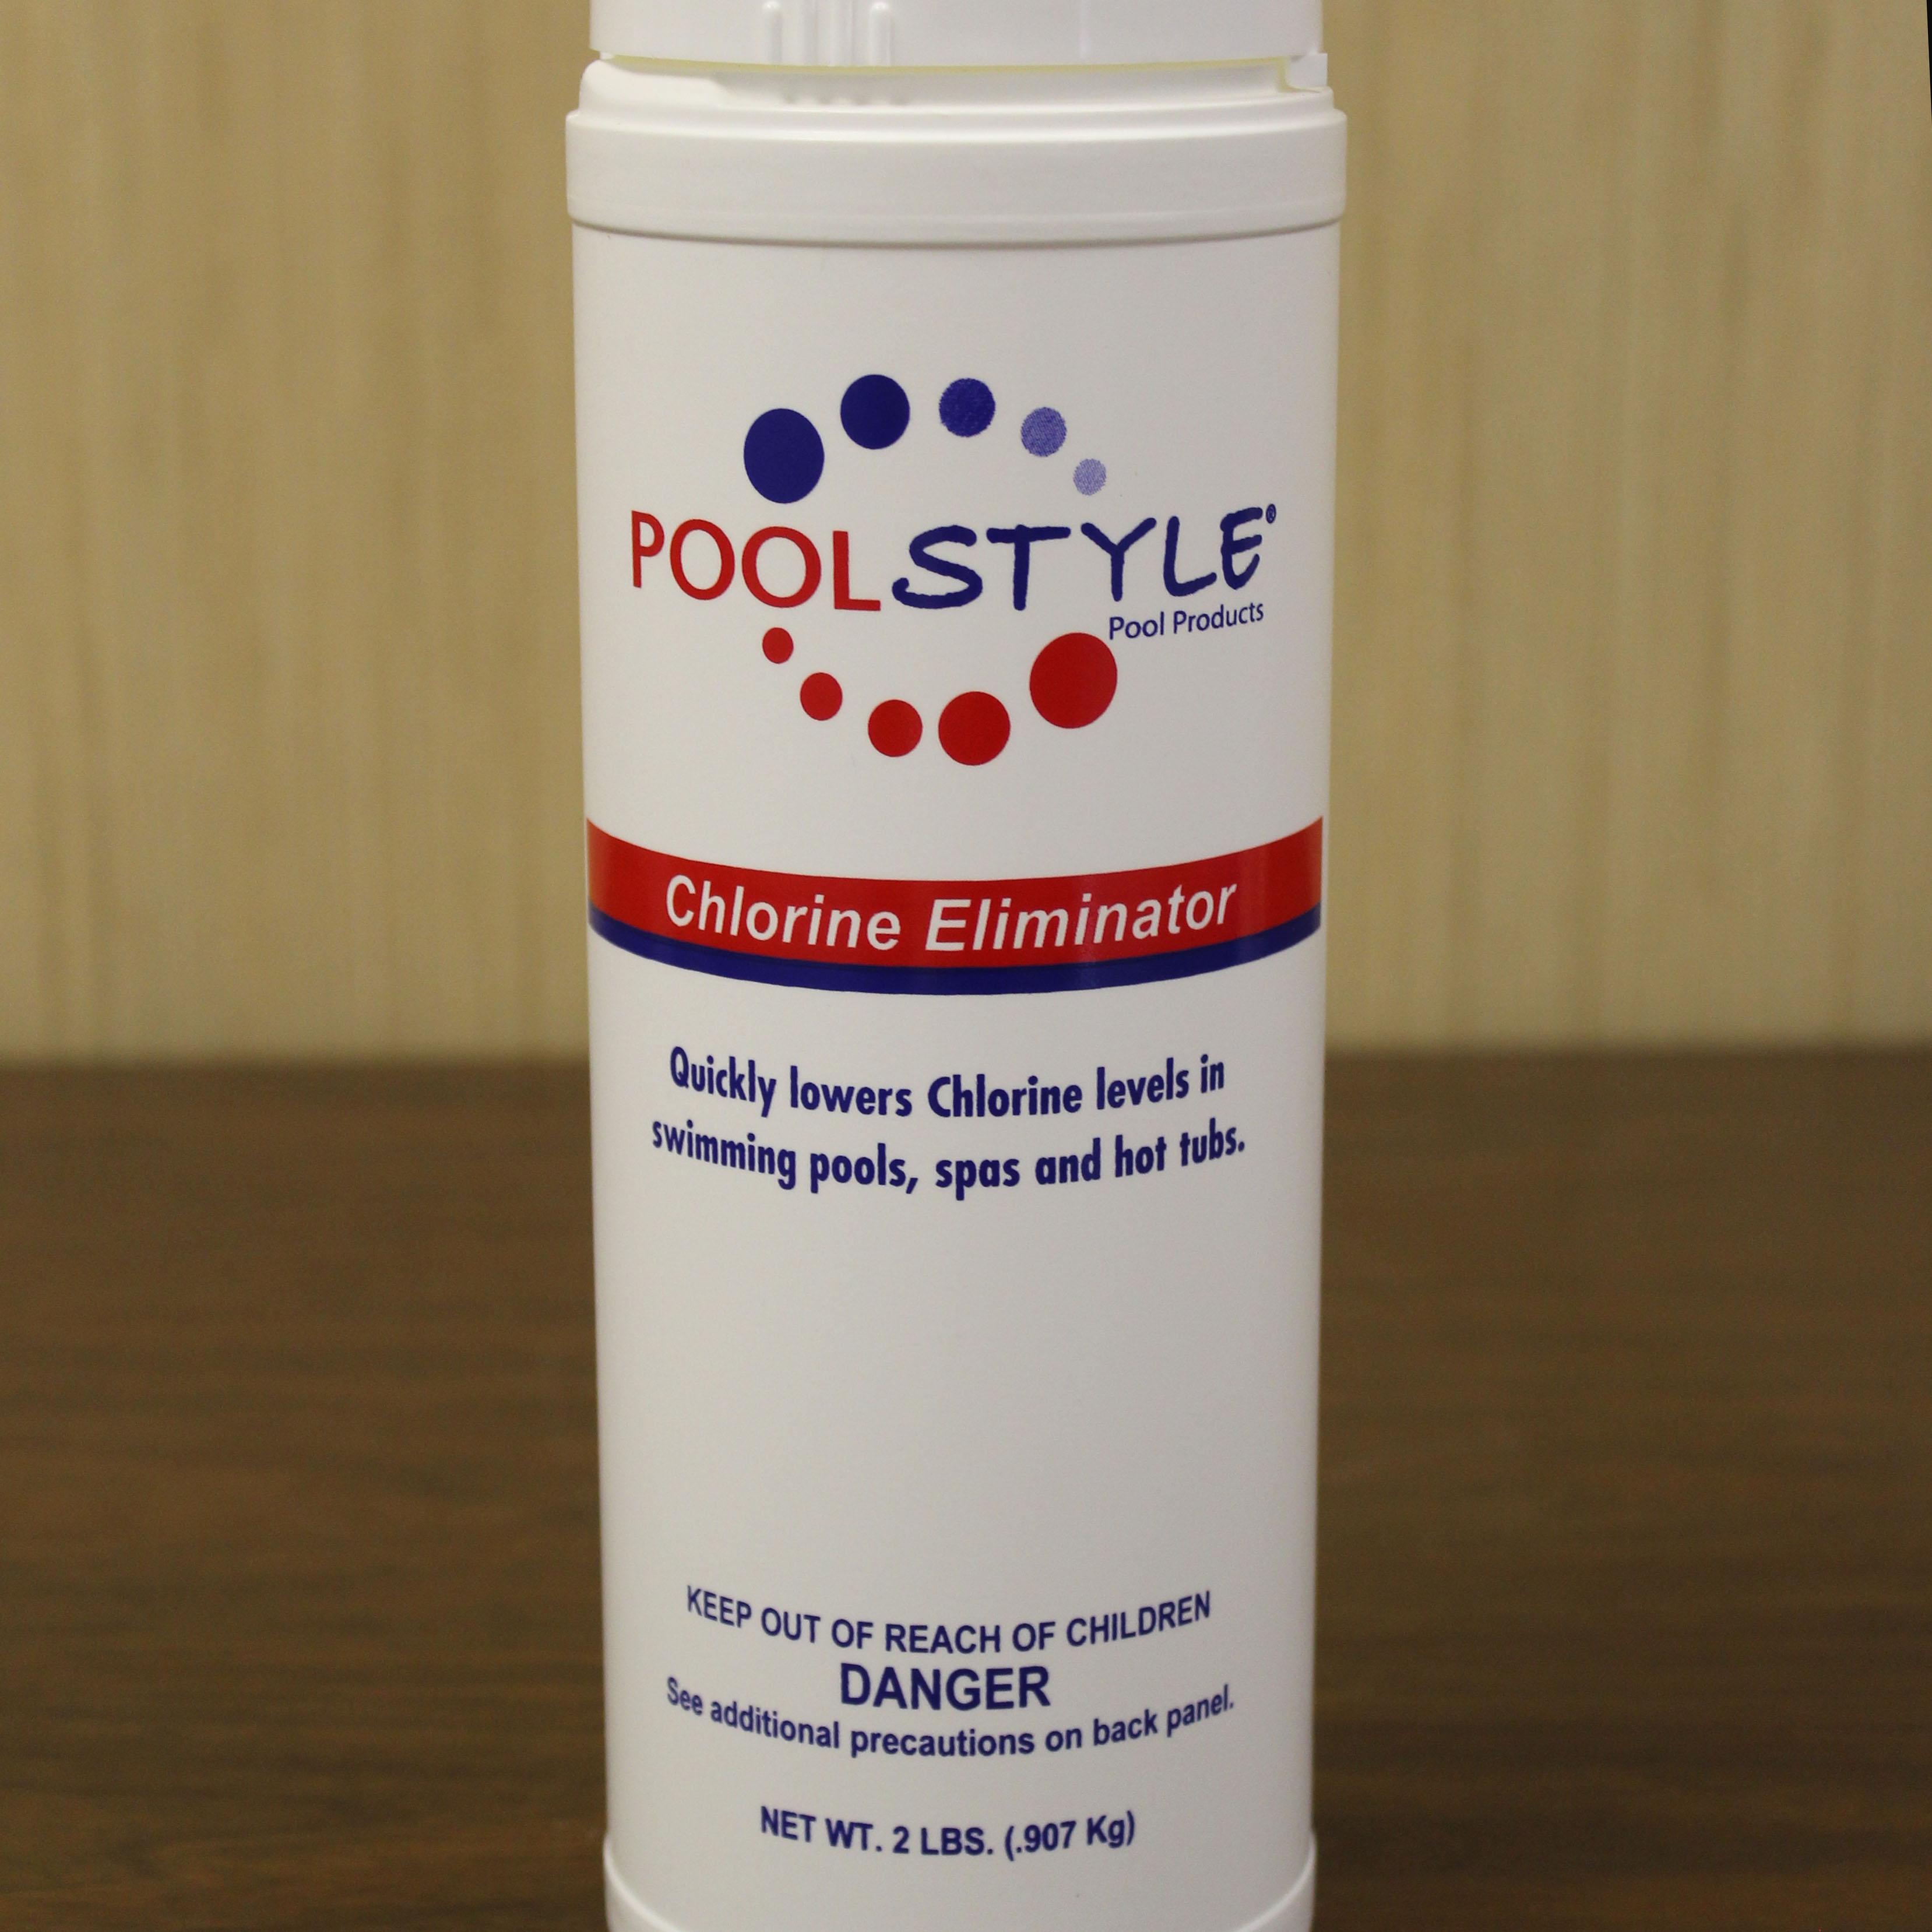 Pool Style Chlorine Eliminator Hudson Aquatic